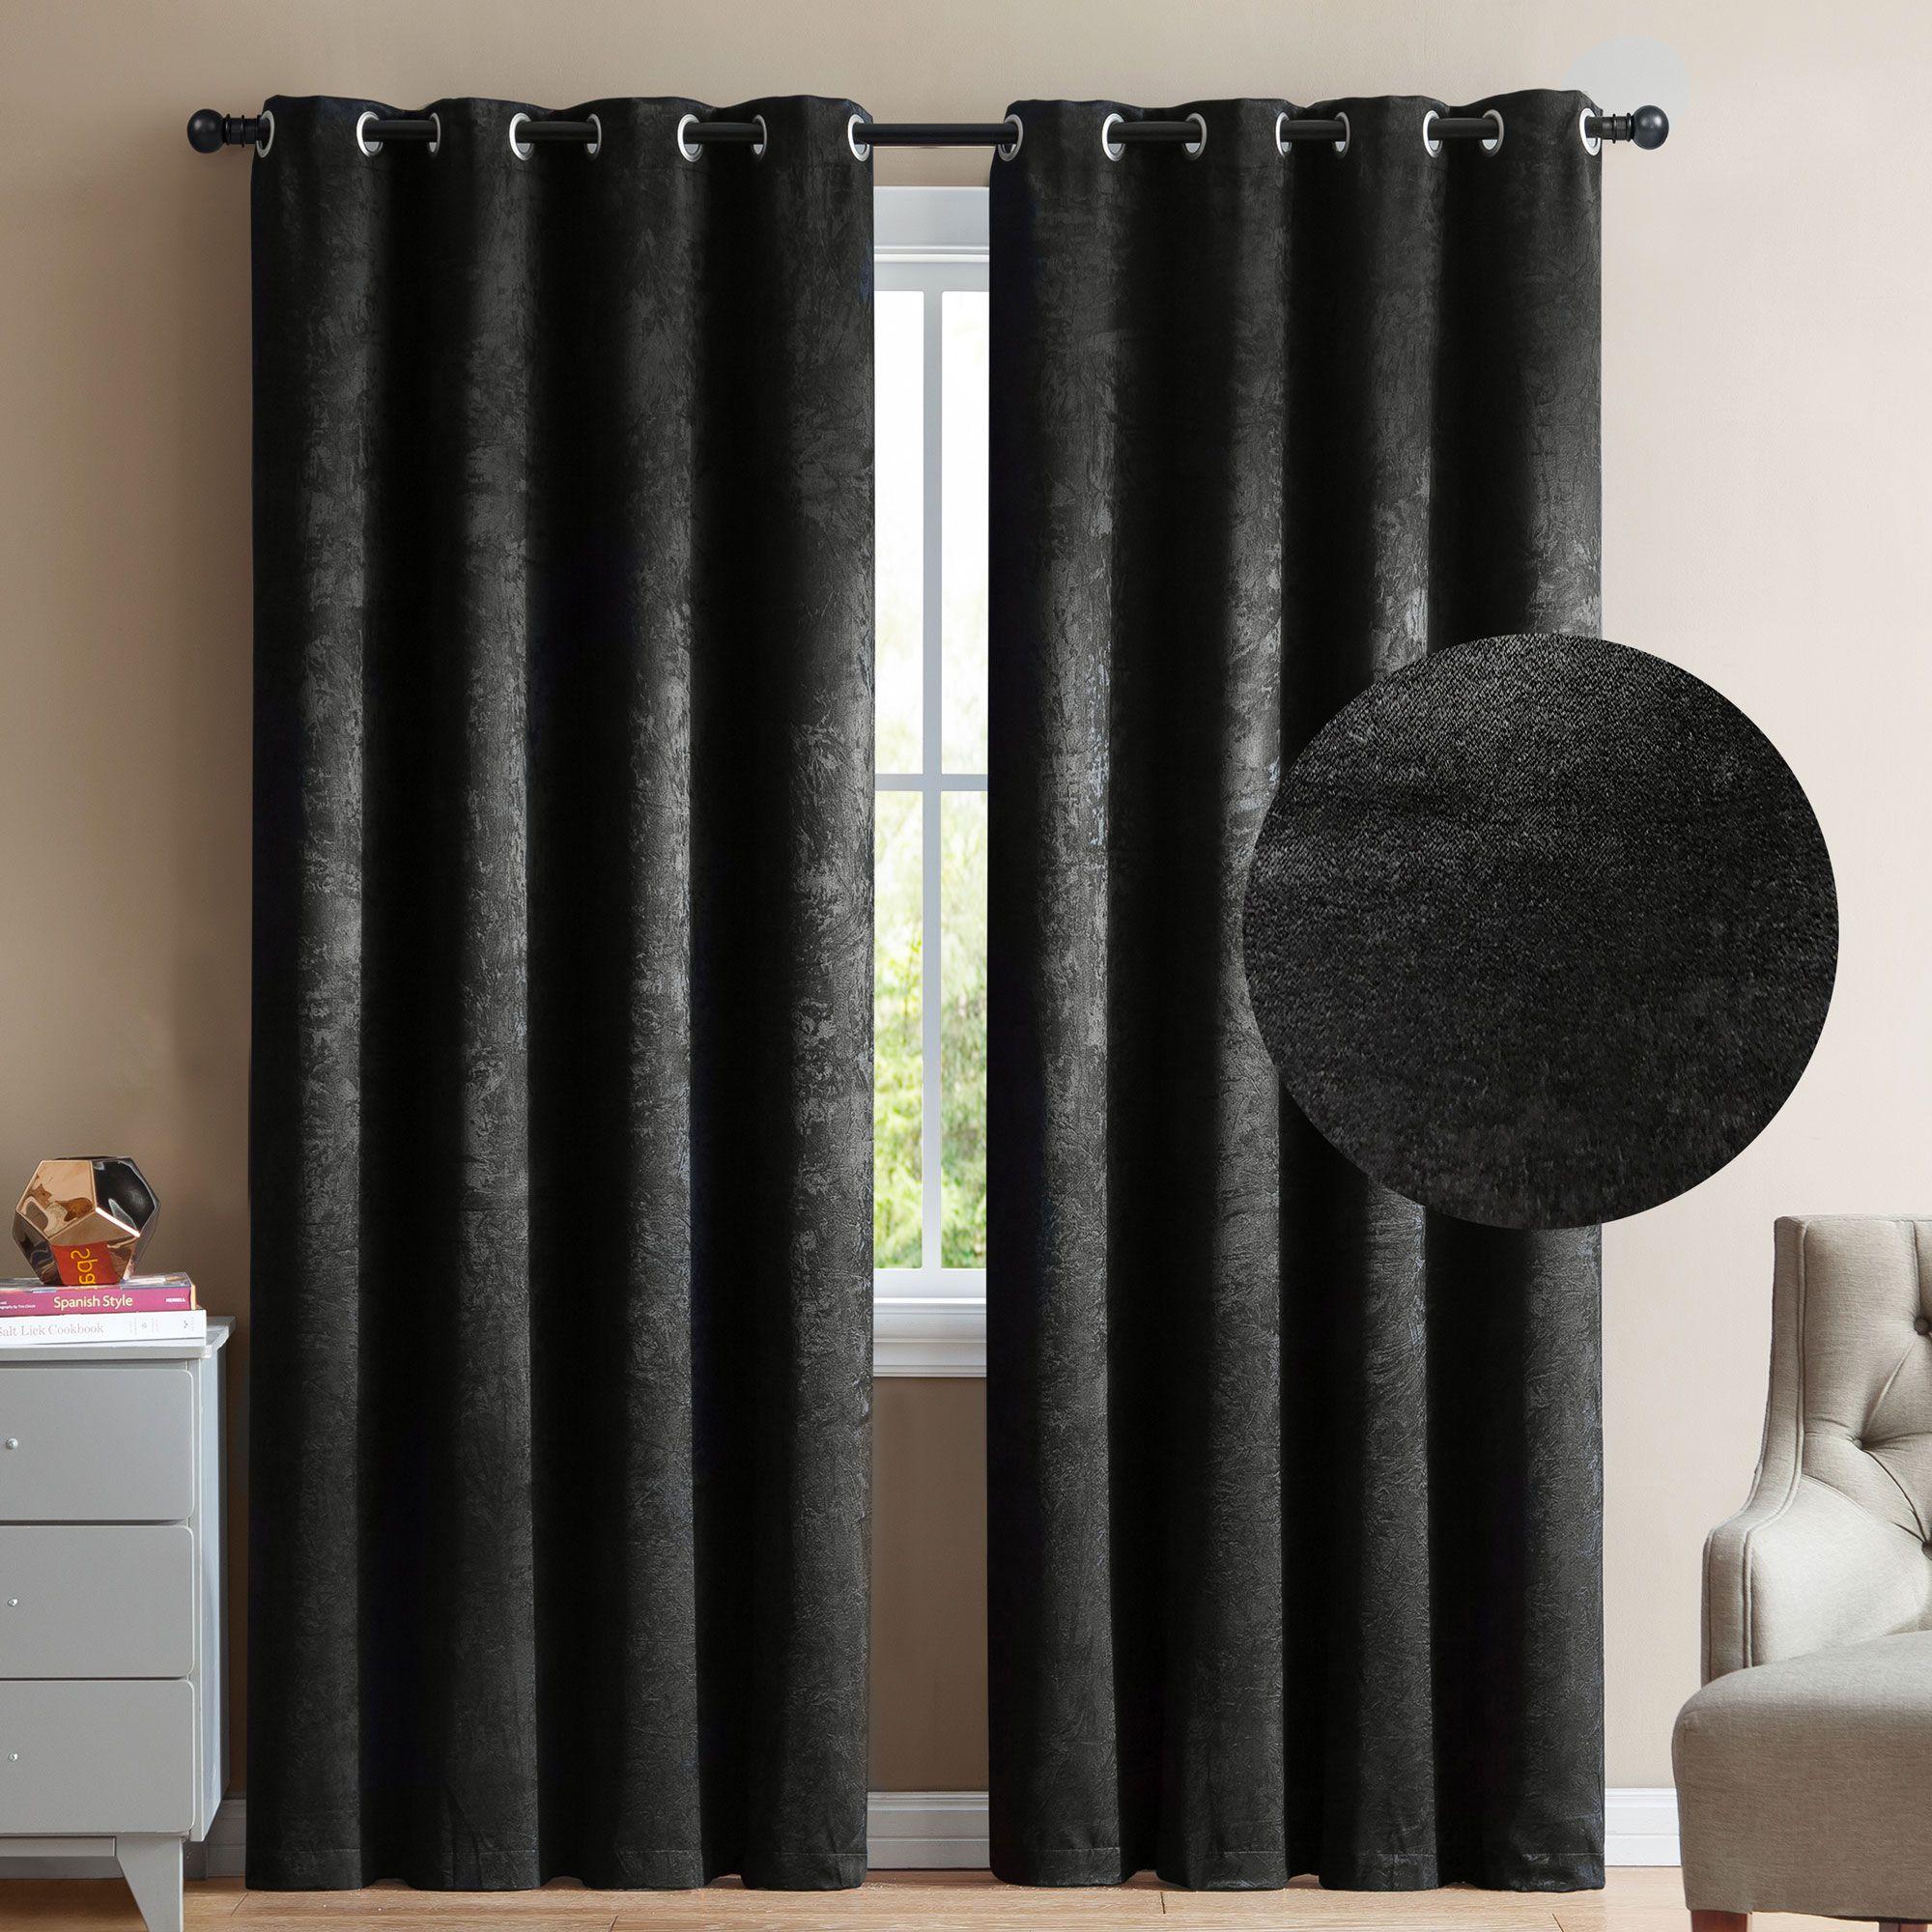 Vcny Marco 2 Blackout Window Curtains 84 Black Velour Velvet